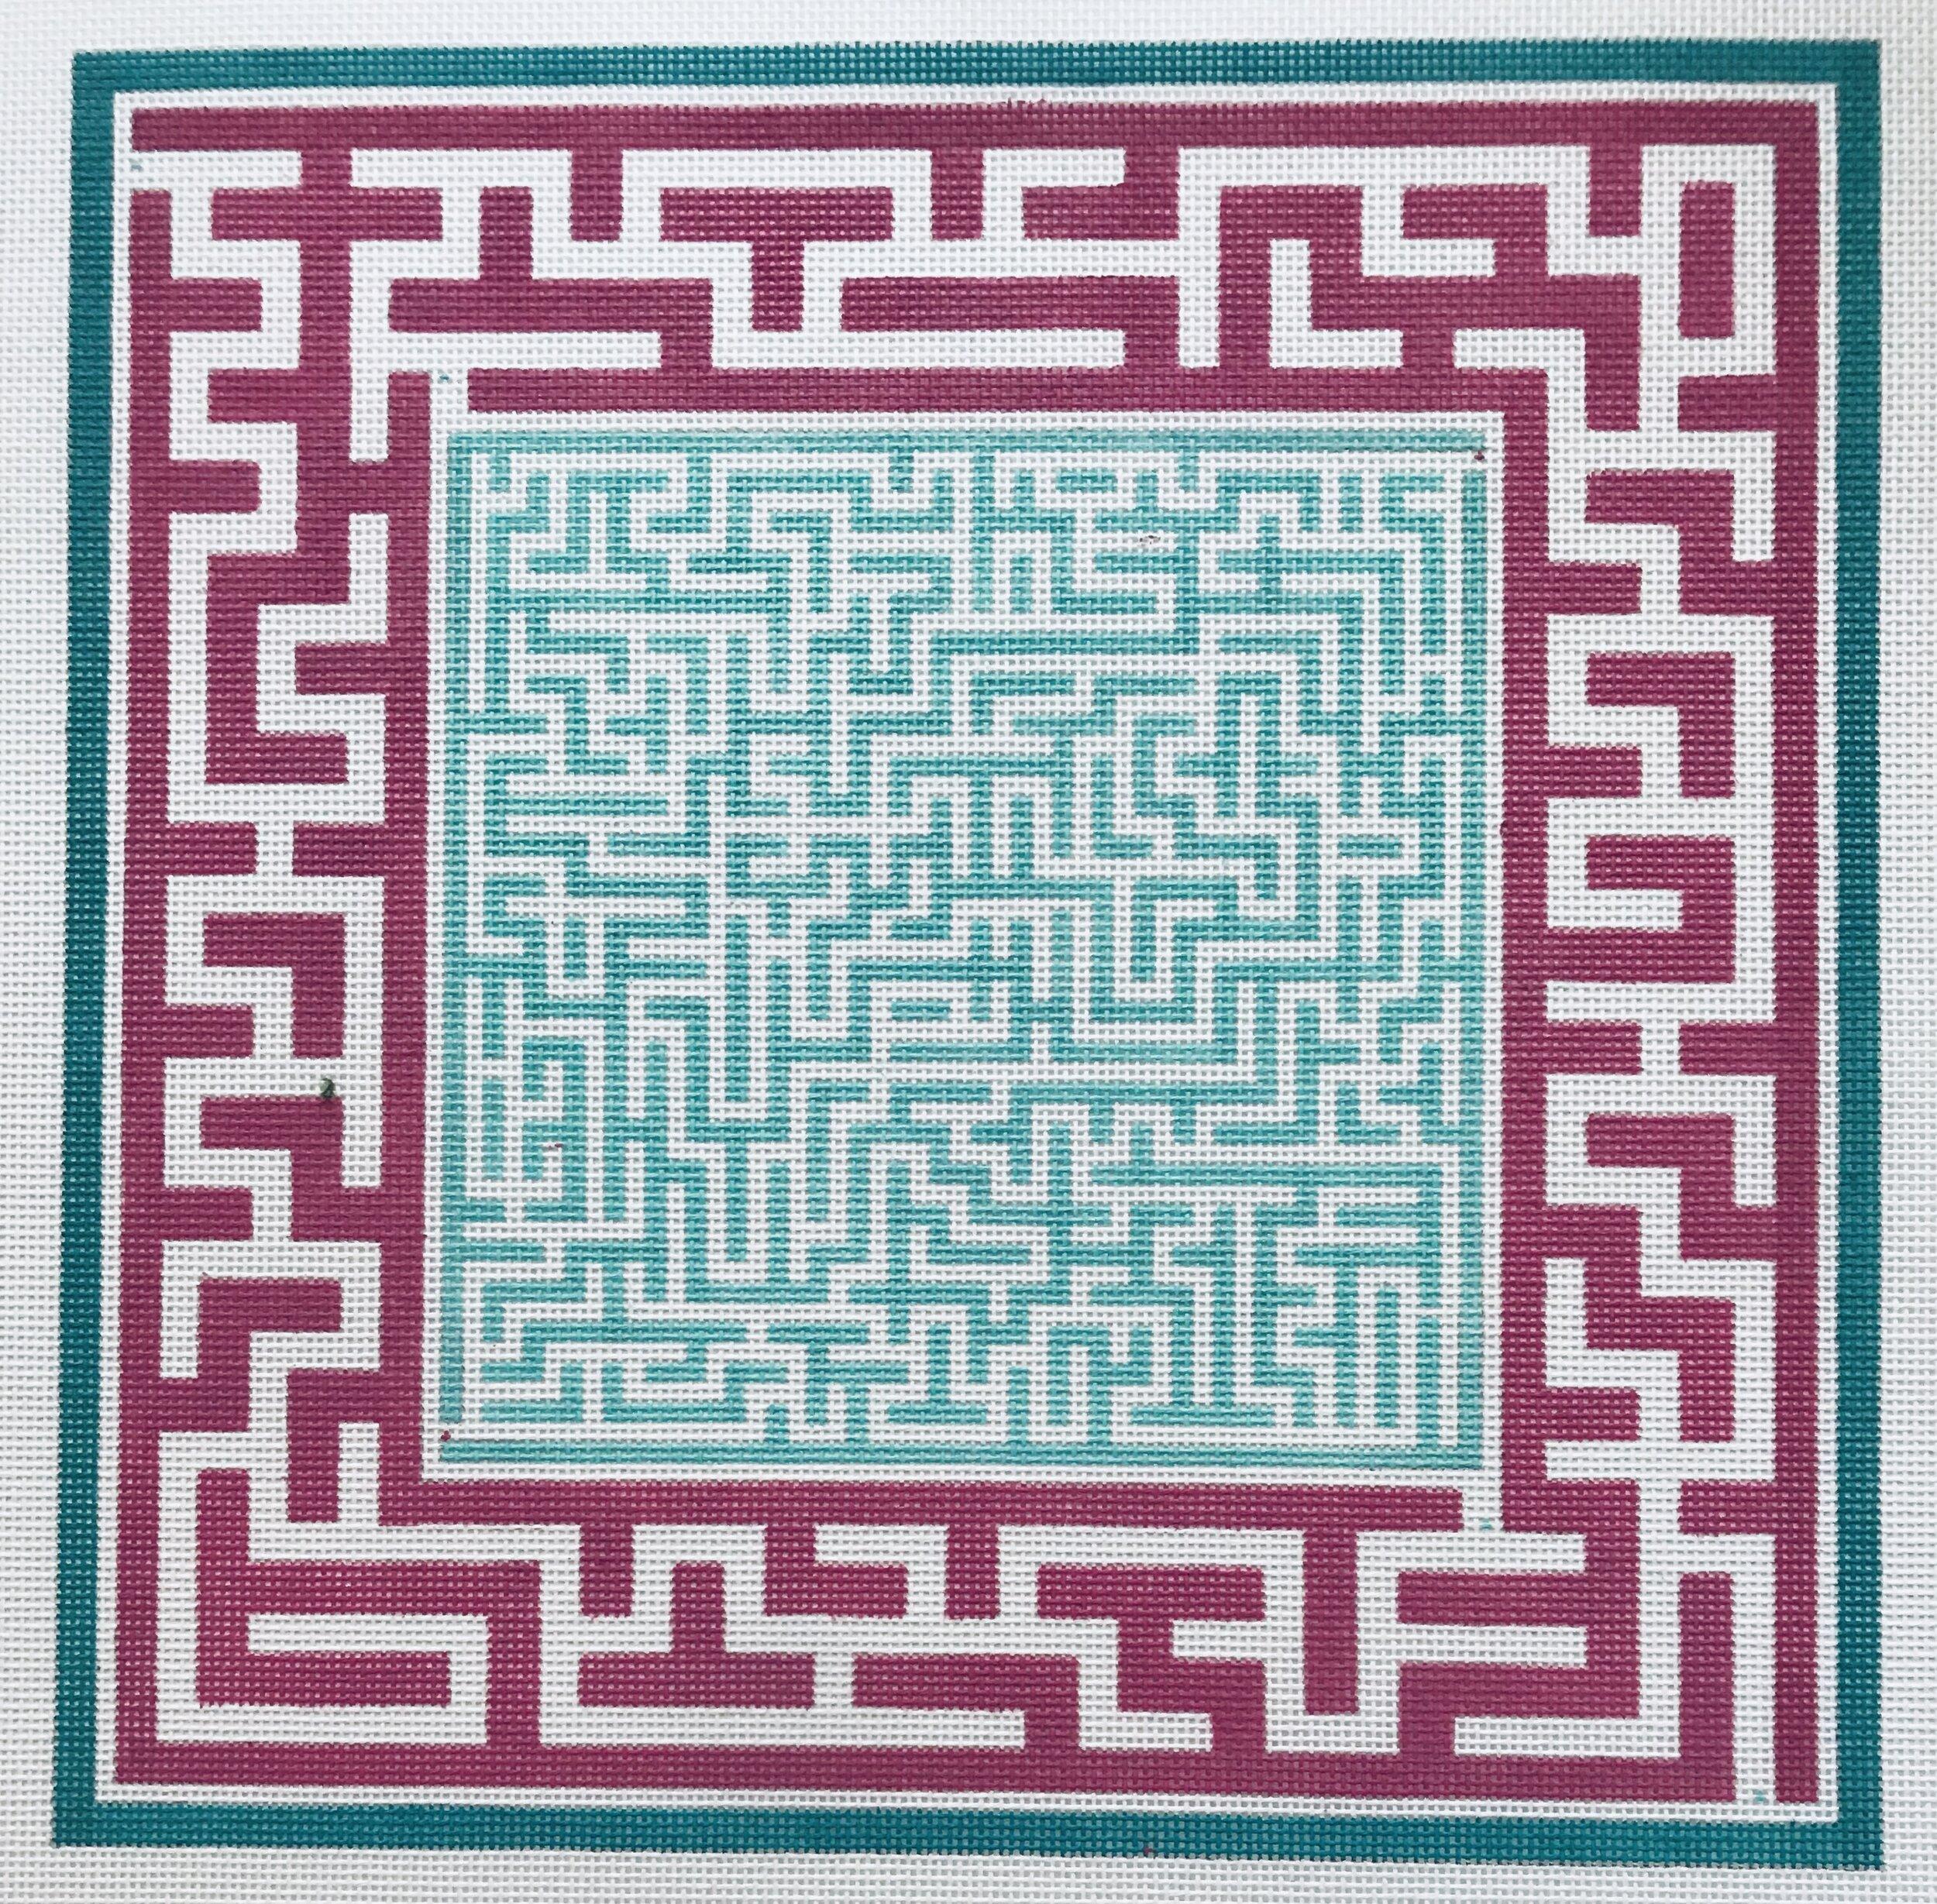 "Green Center Maze AL67   12.5"" 12.5"" on 14 mesh"